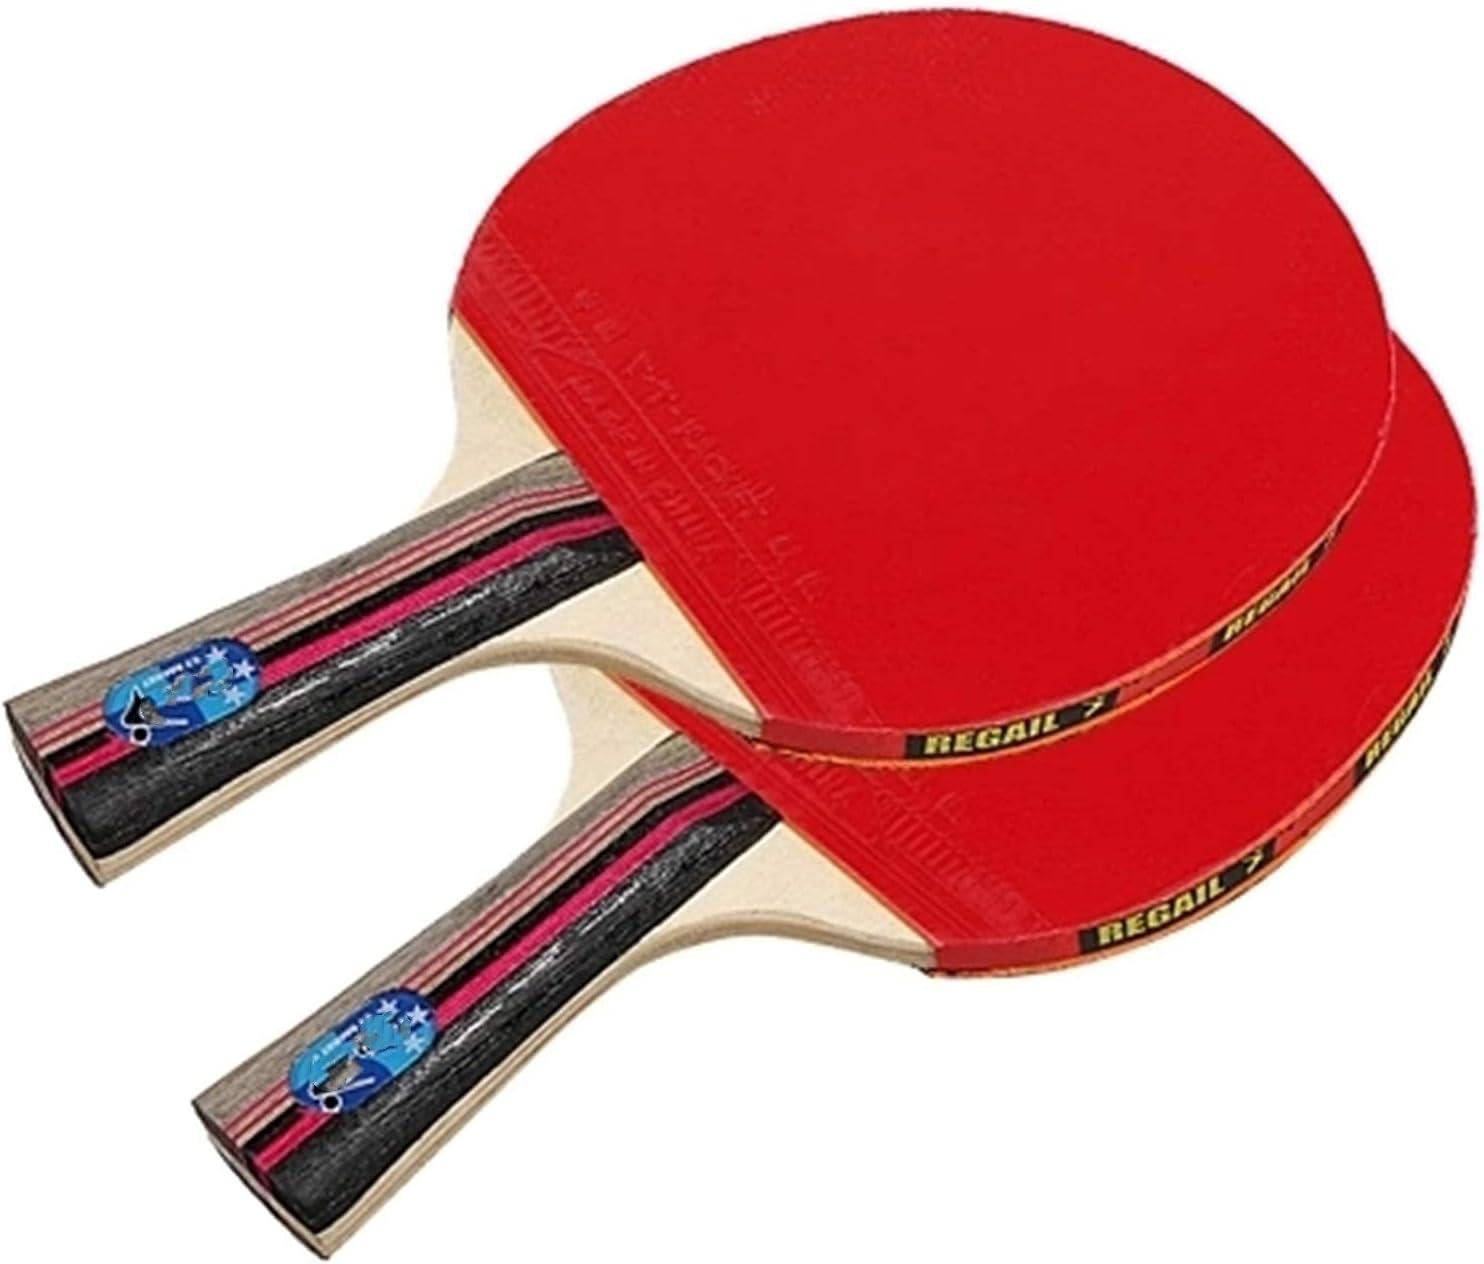 SMYONGPING Ping Popular standard Pong Paddle Paddles Quality Sale Tennis Table Ra